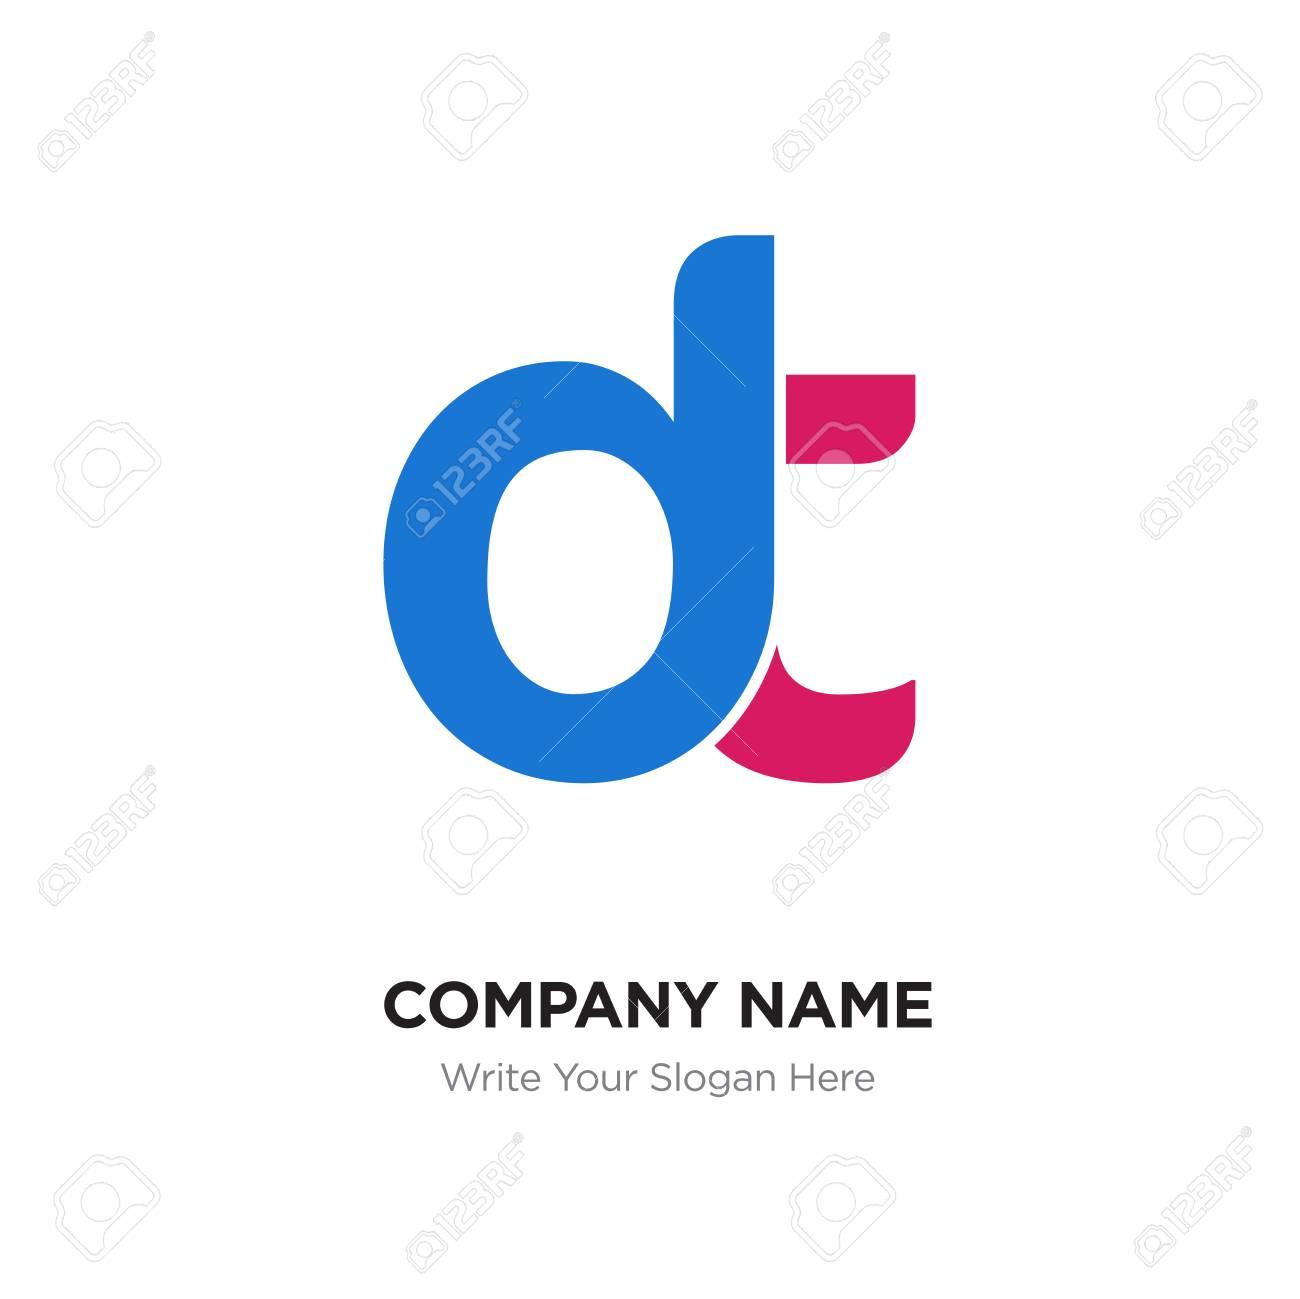 Abstract letter dt,dt logo design template, blue & red Alphabet